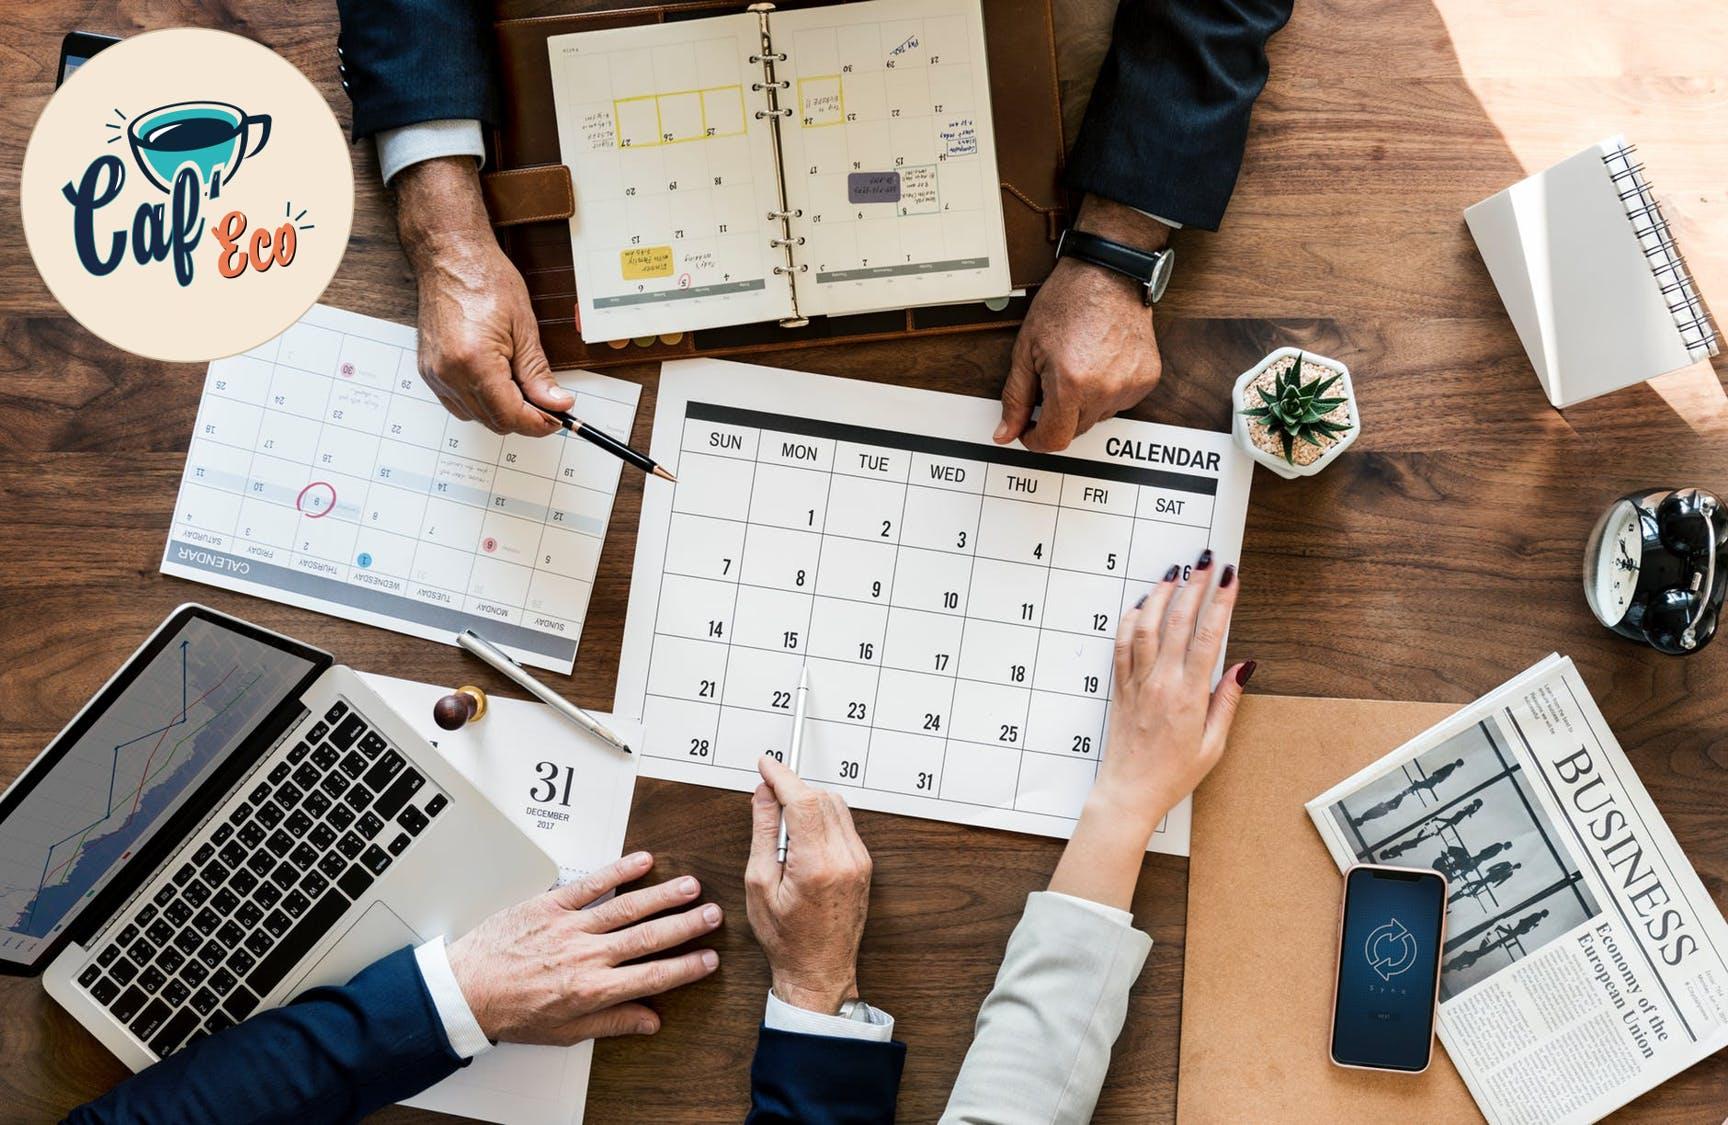 CAF'ECO - Comprendre son comptable